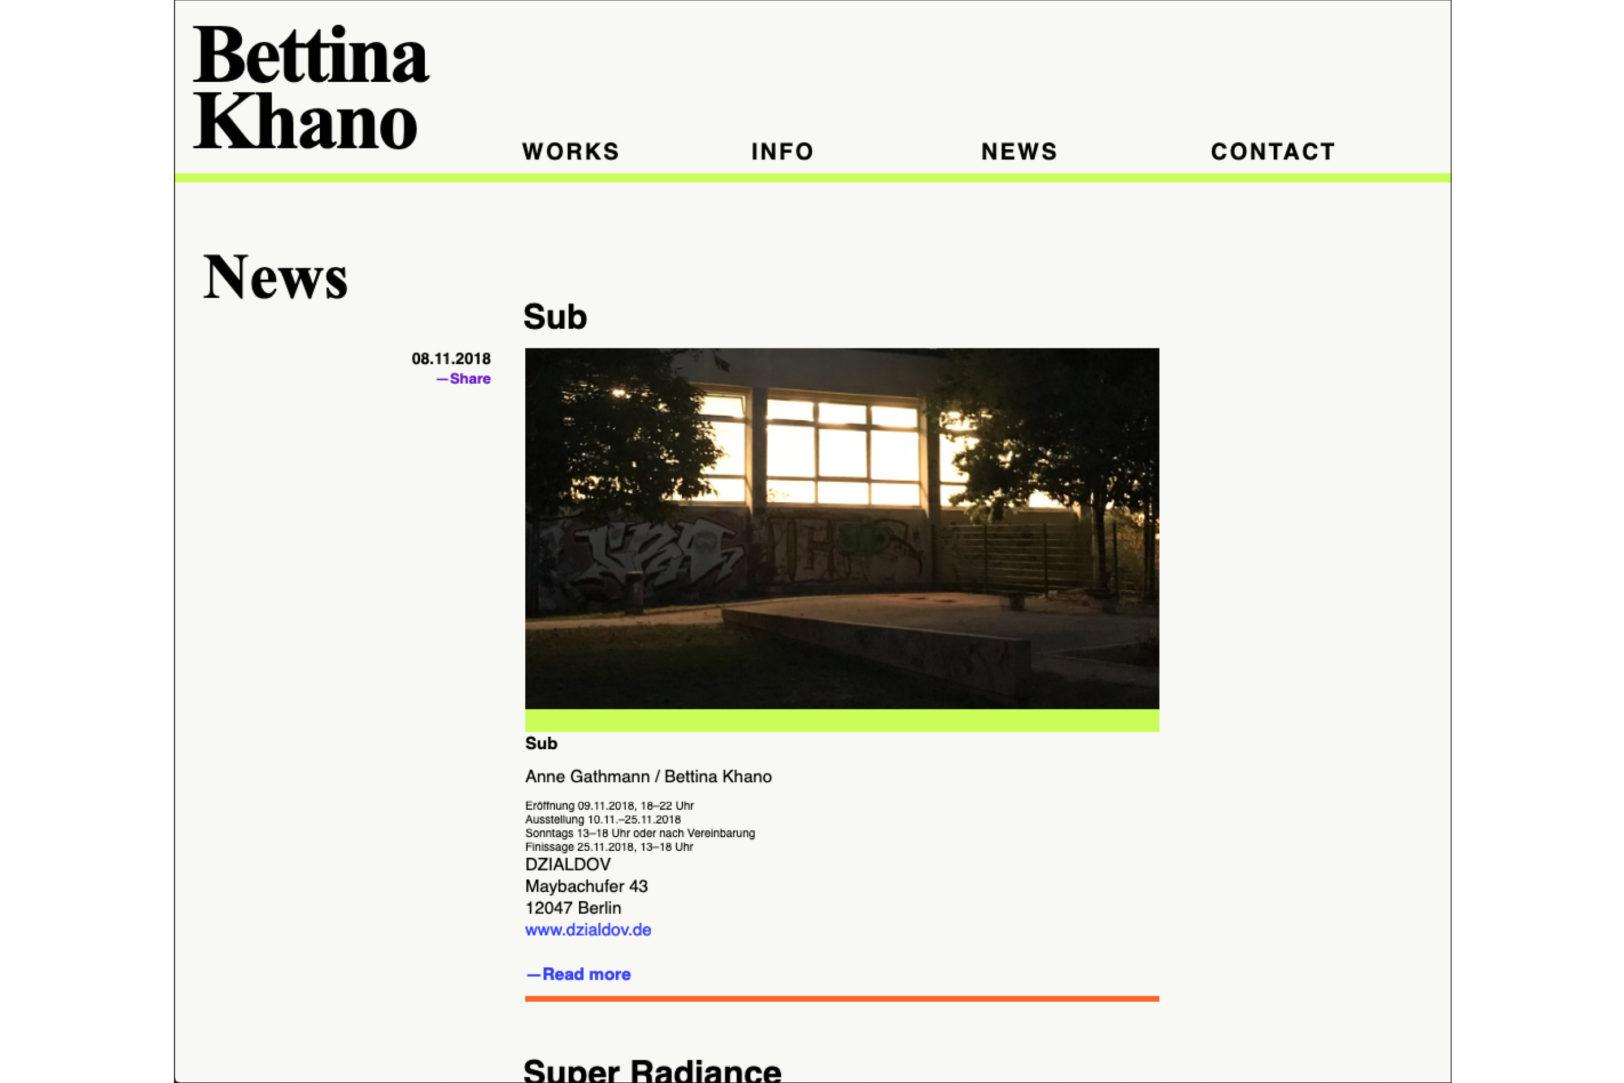 http://e-o-t.de/wordpress/wp-content/uploads/2014/05/eot-Khano-Web5.jpg